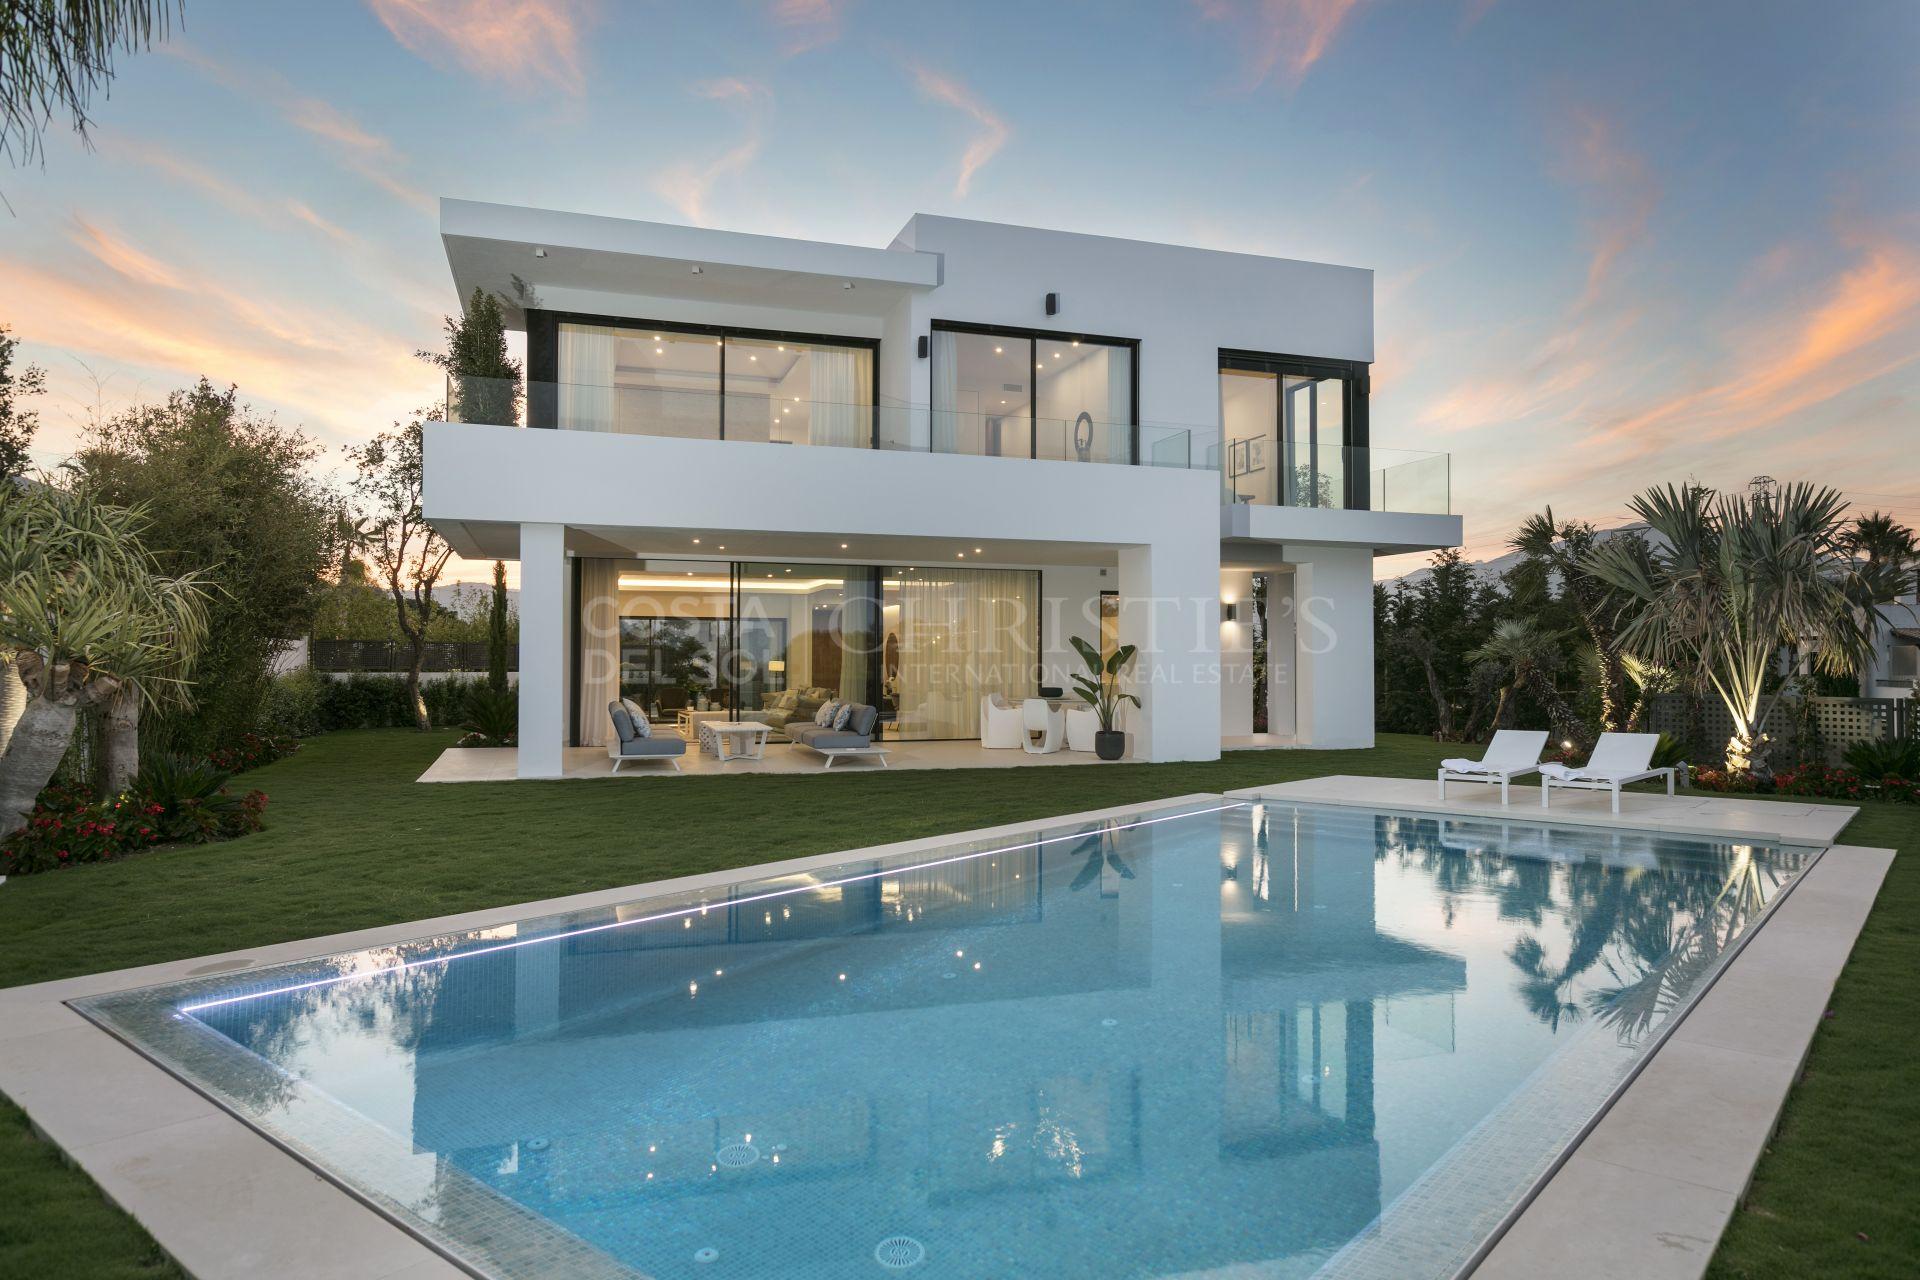 C8NCEPT VILLAS, Marbella - Vastgoedproject in Marbella | Christie's International Real Estate